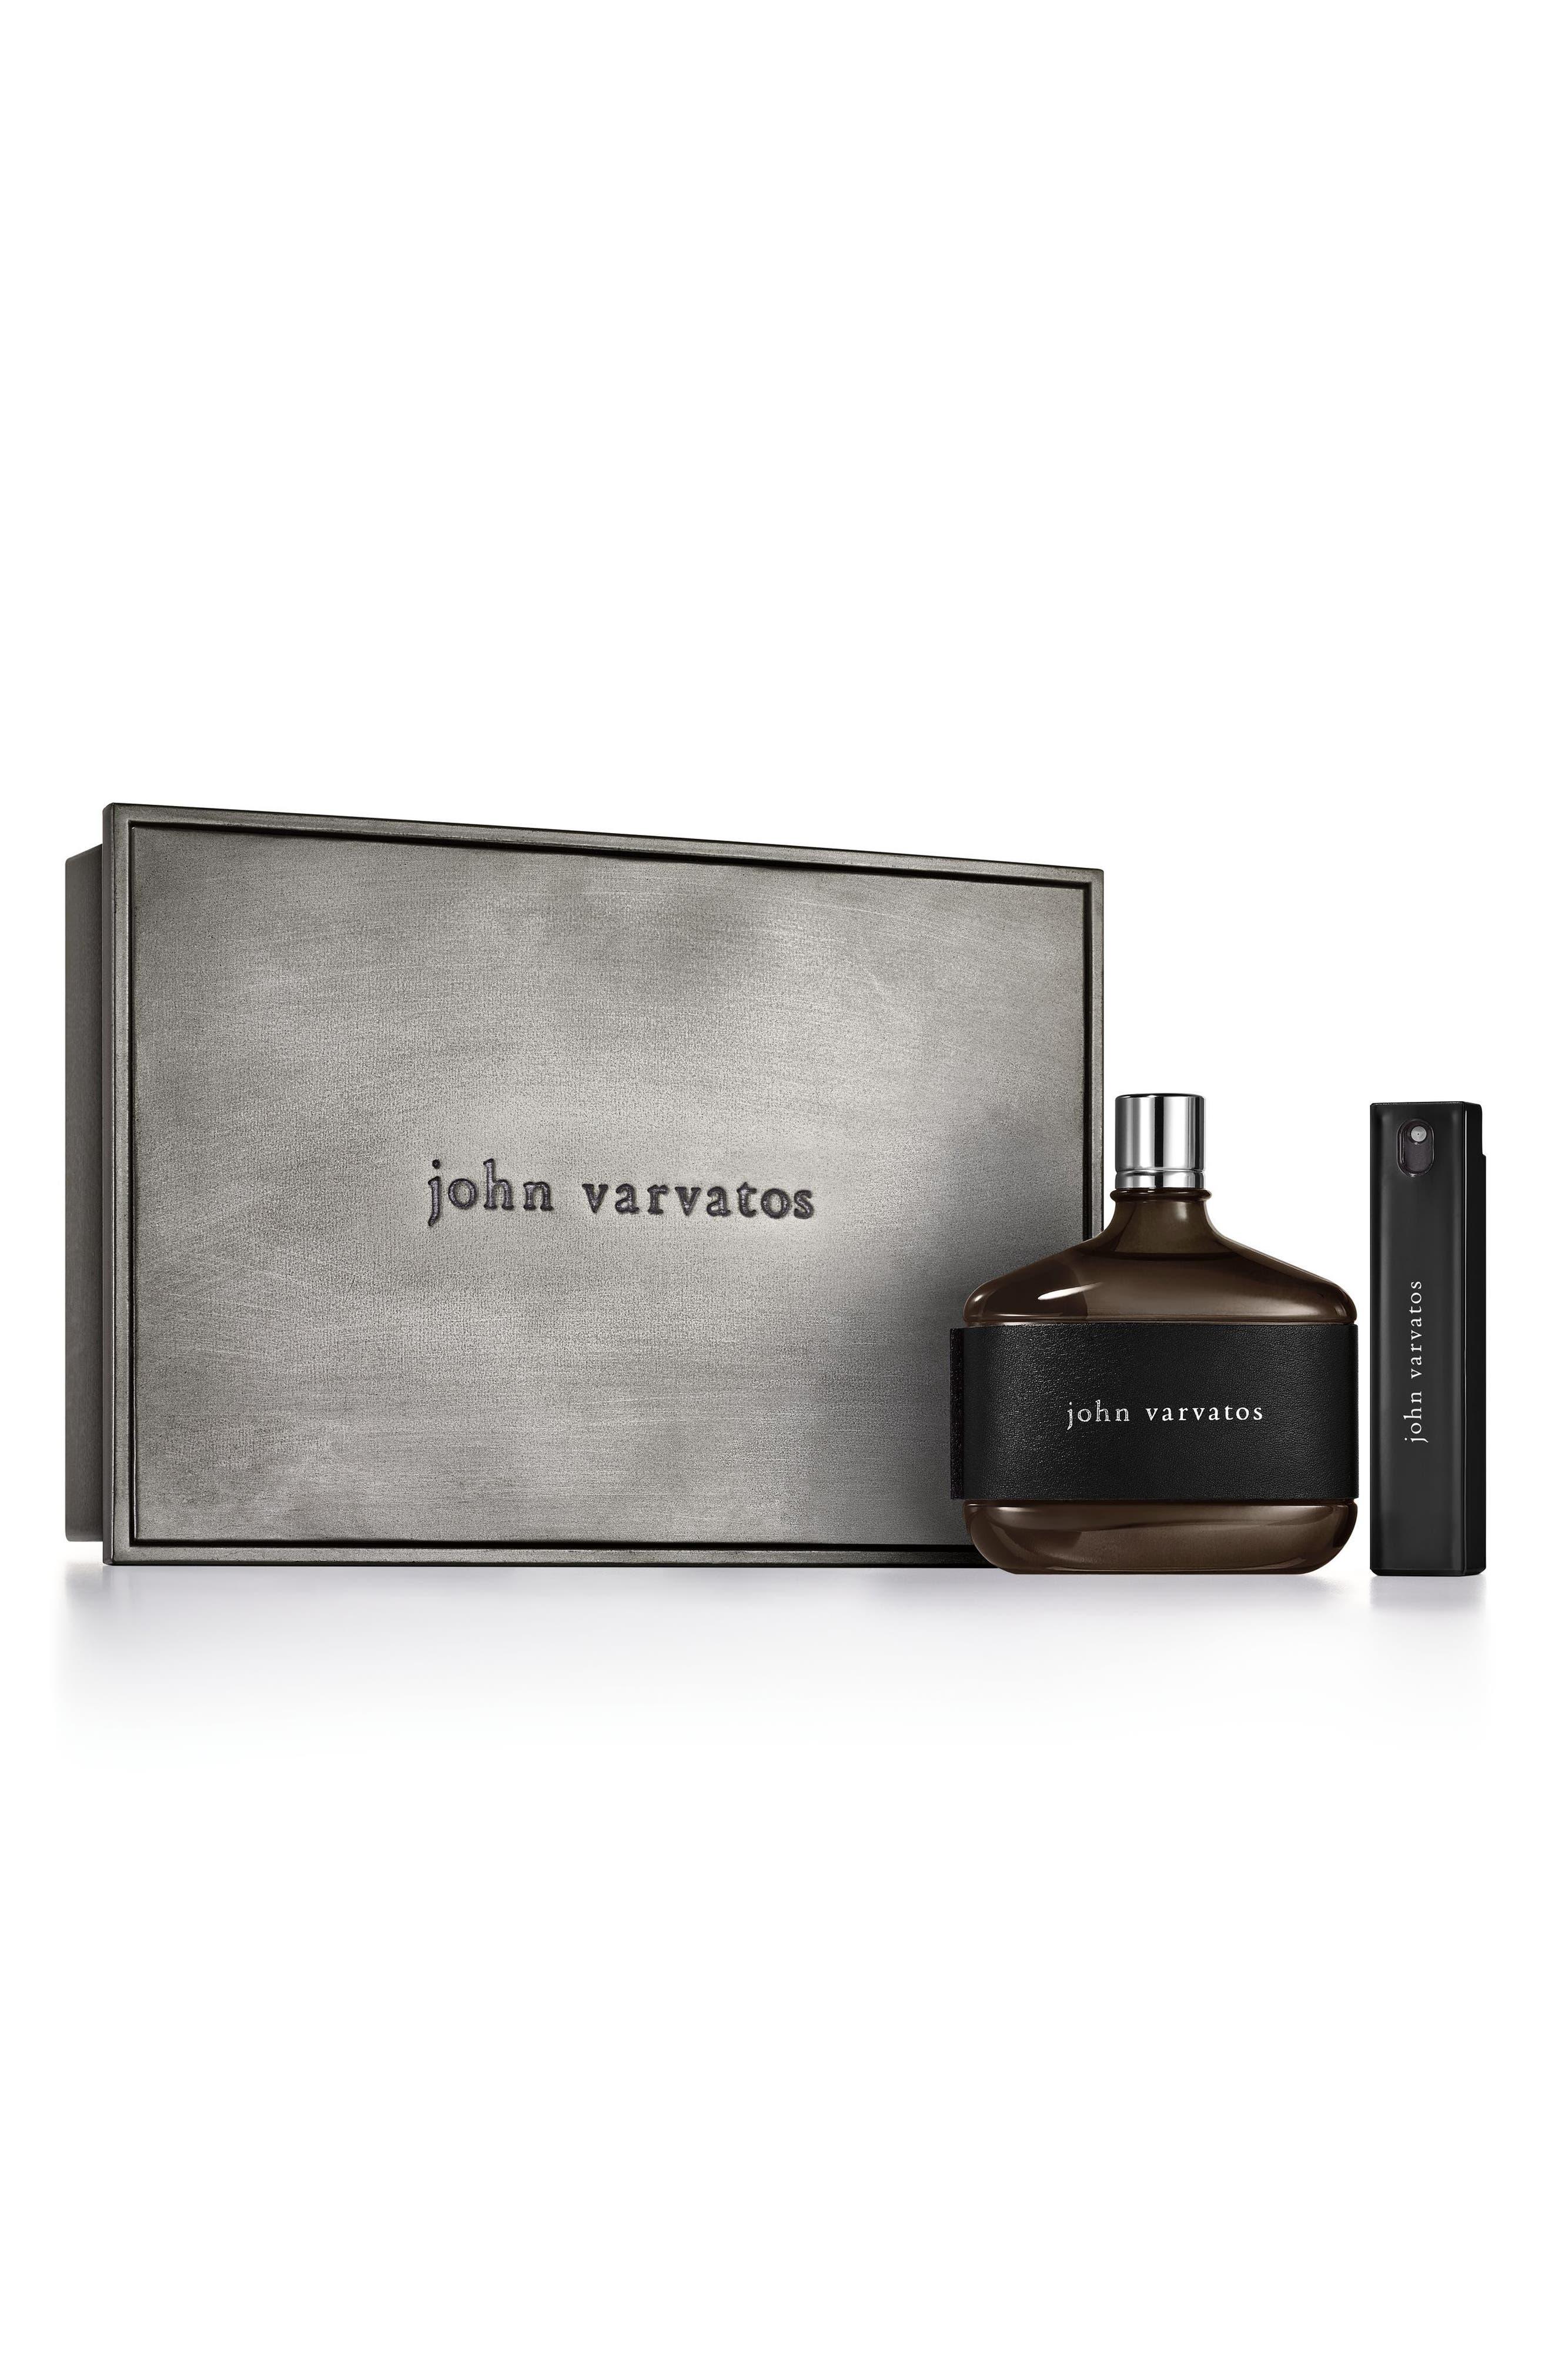 John Varvatos Heritage Set ($119 Value)